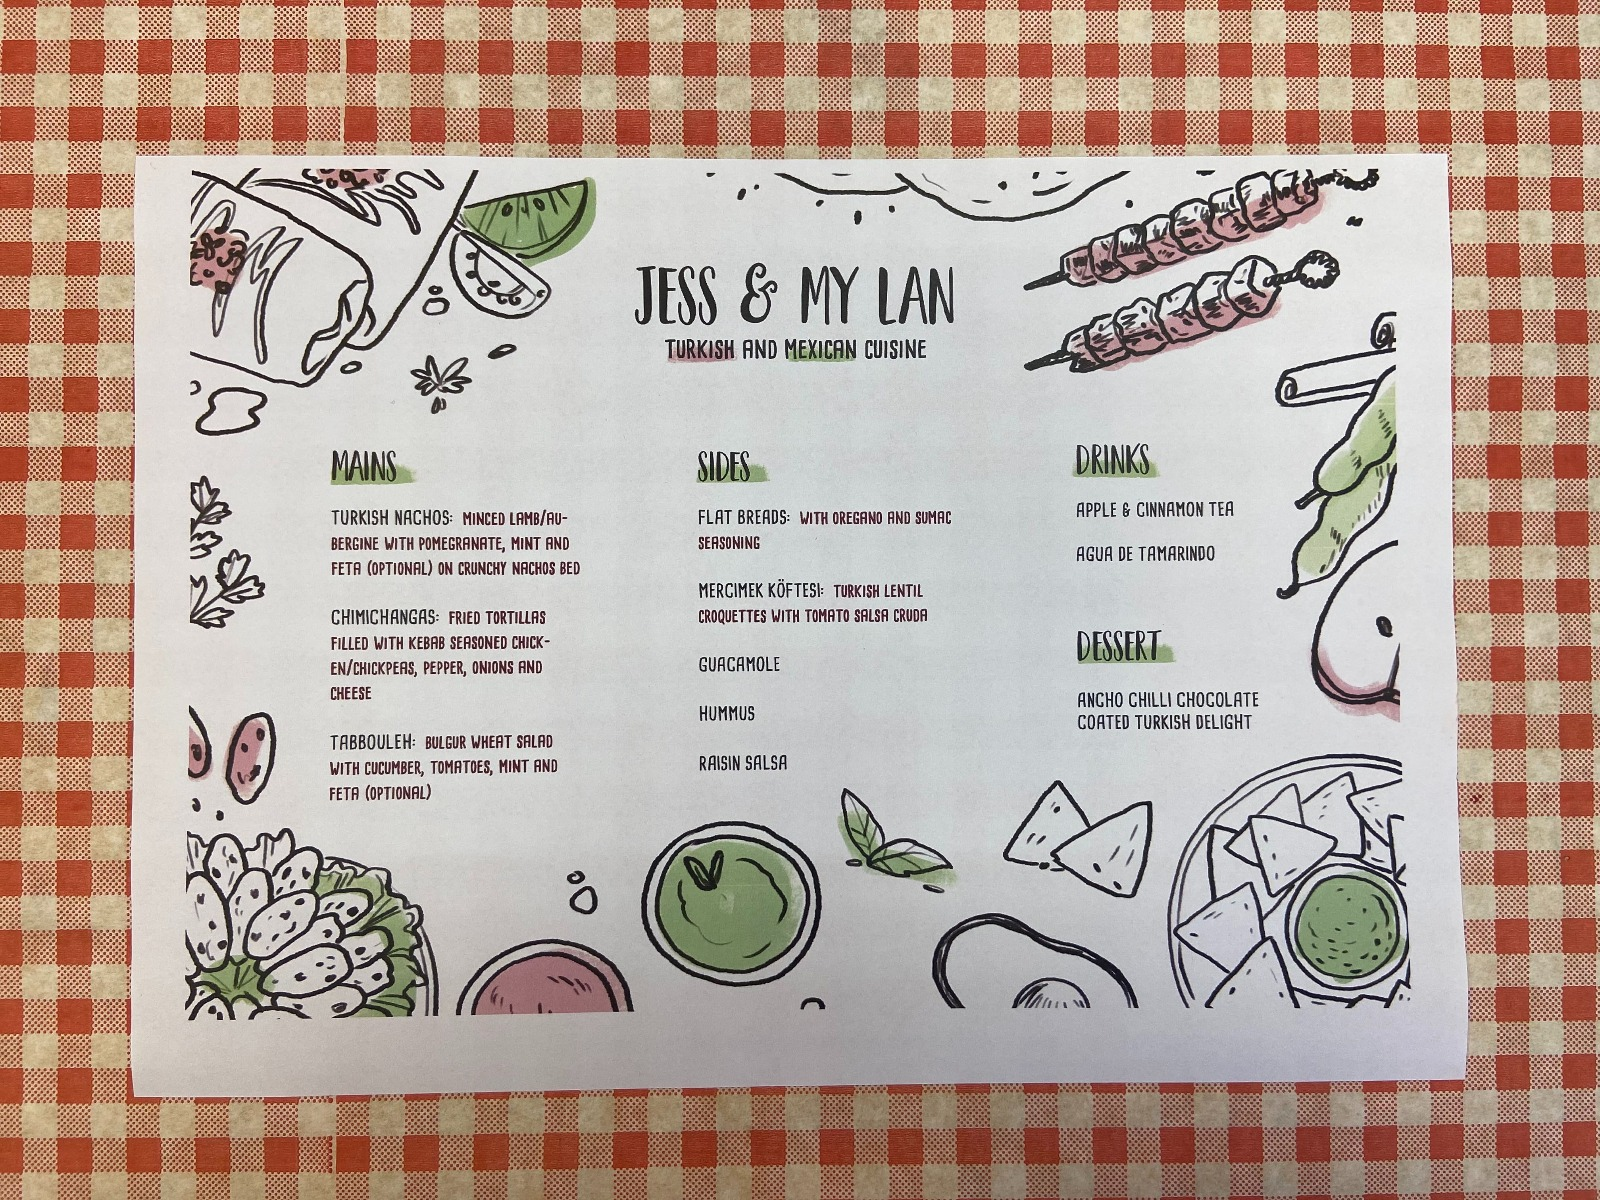 Jess and My Lan's menu